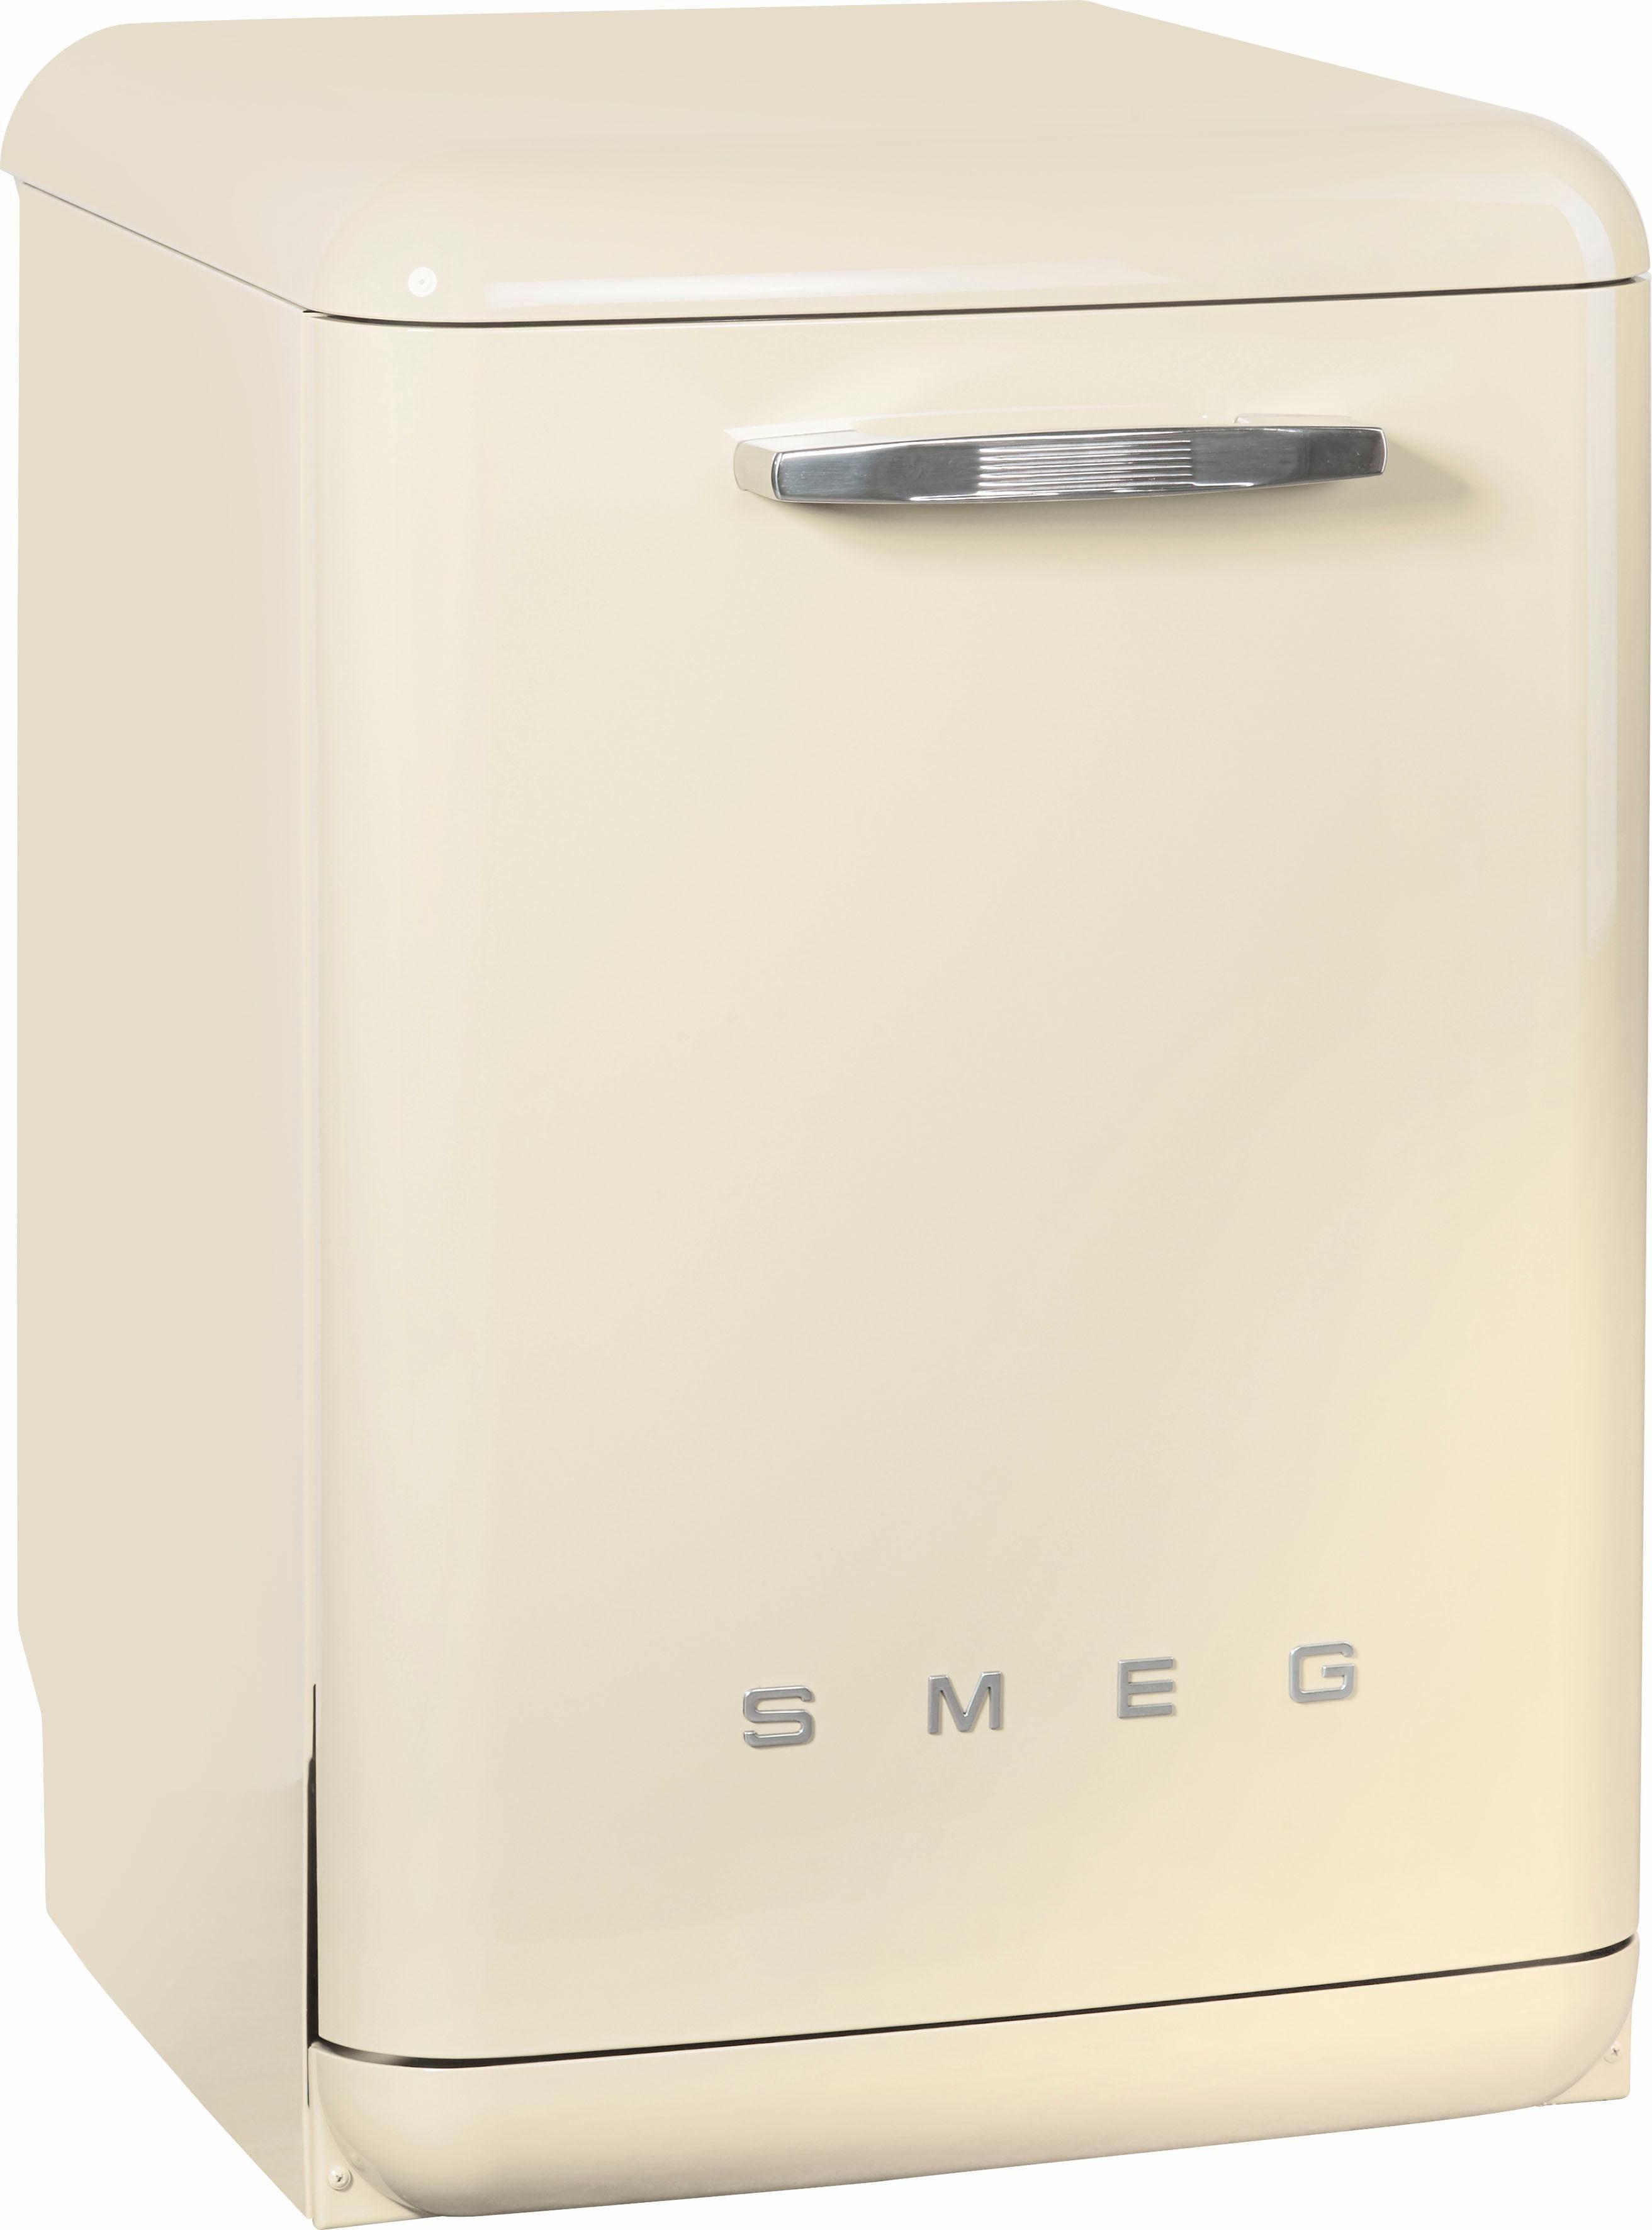 Smeg Standgeschirrspüler, 0,85 l, 13 Maßgedecke, Energieeffizienzklasse A+++